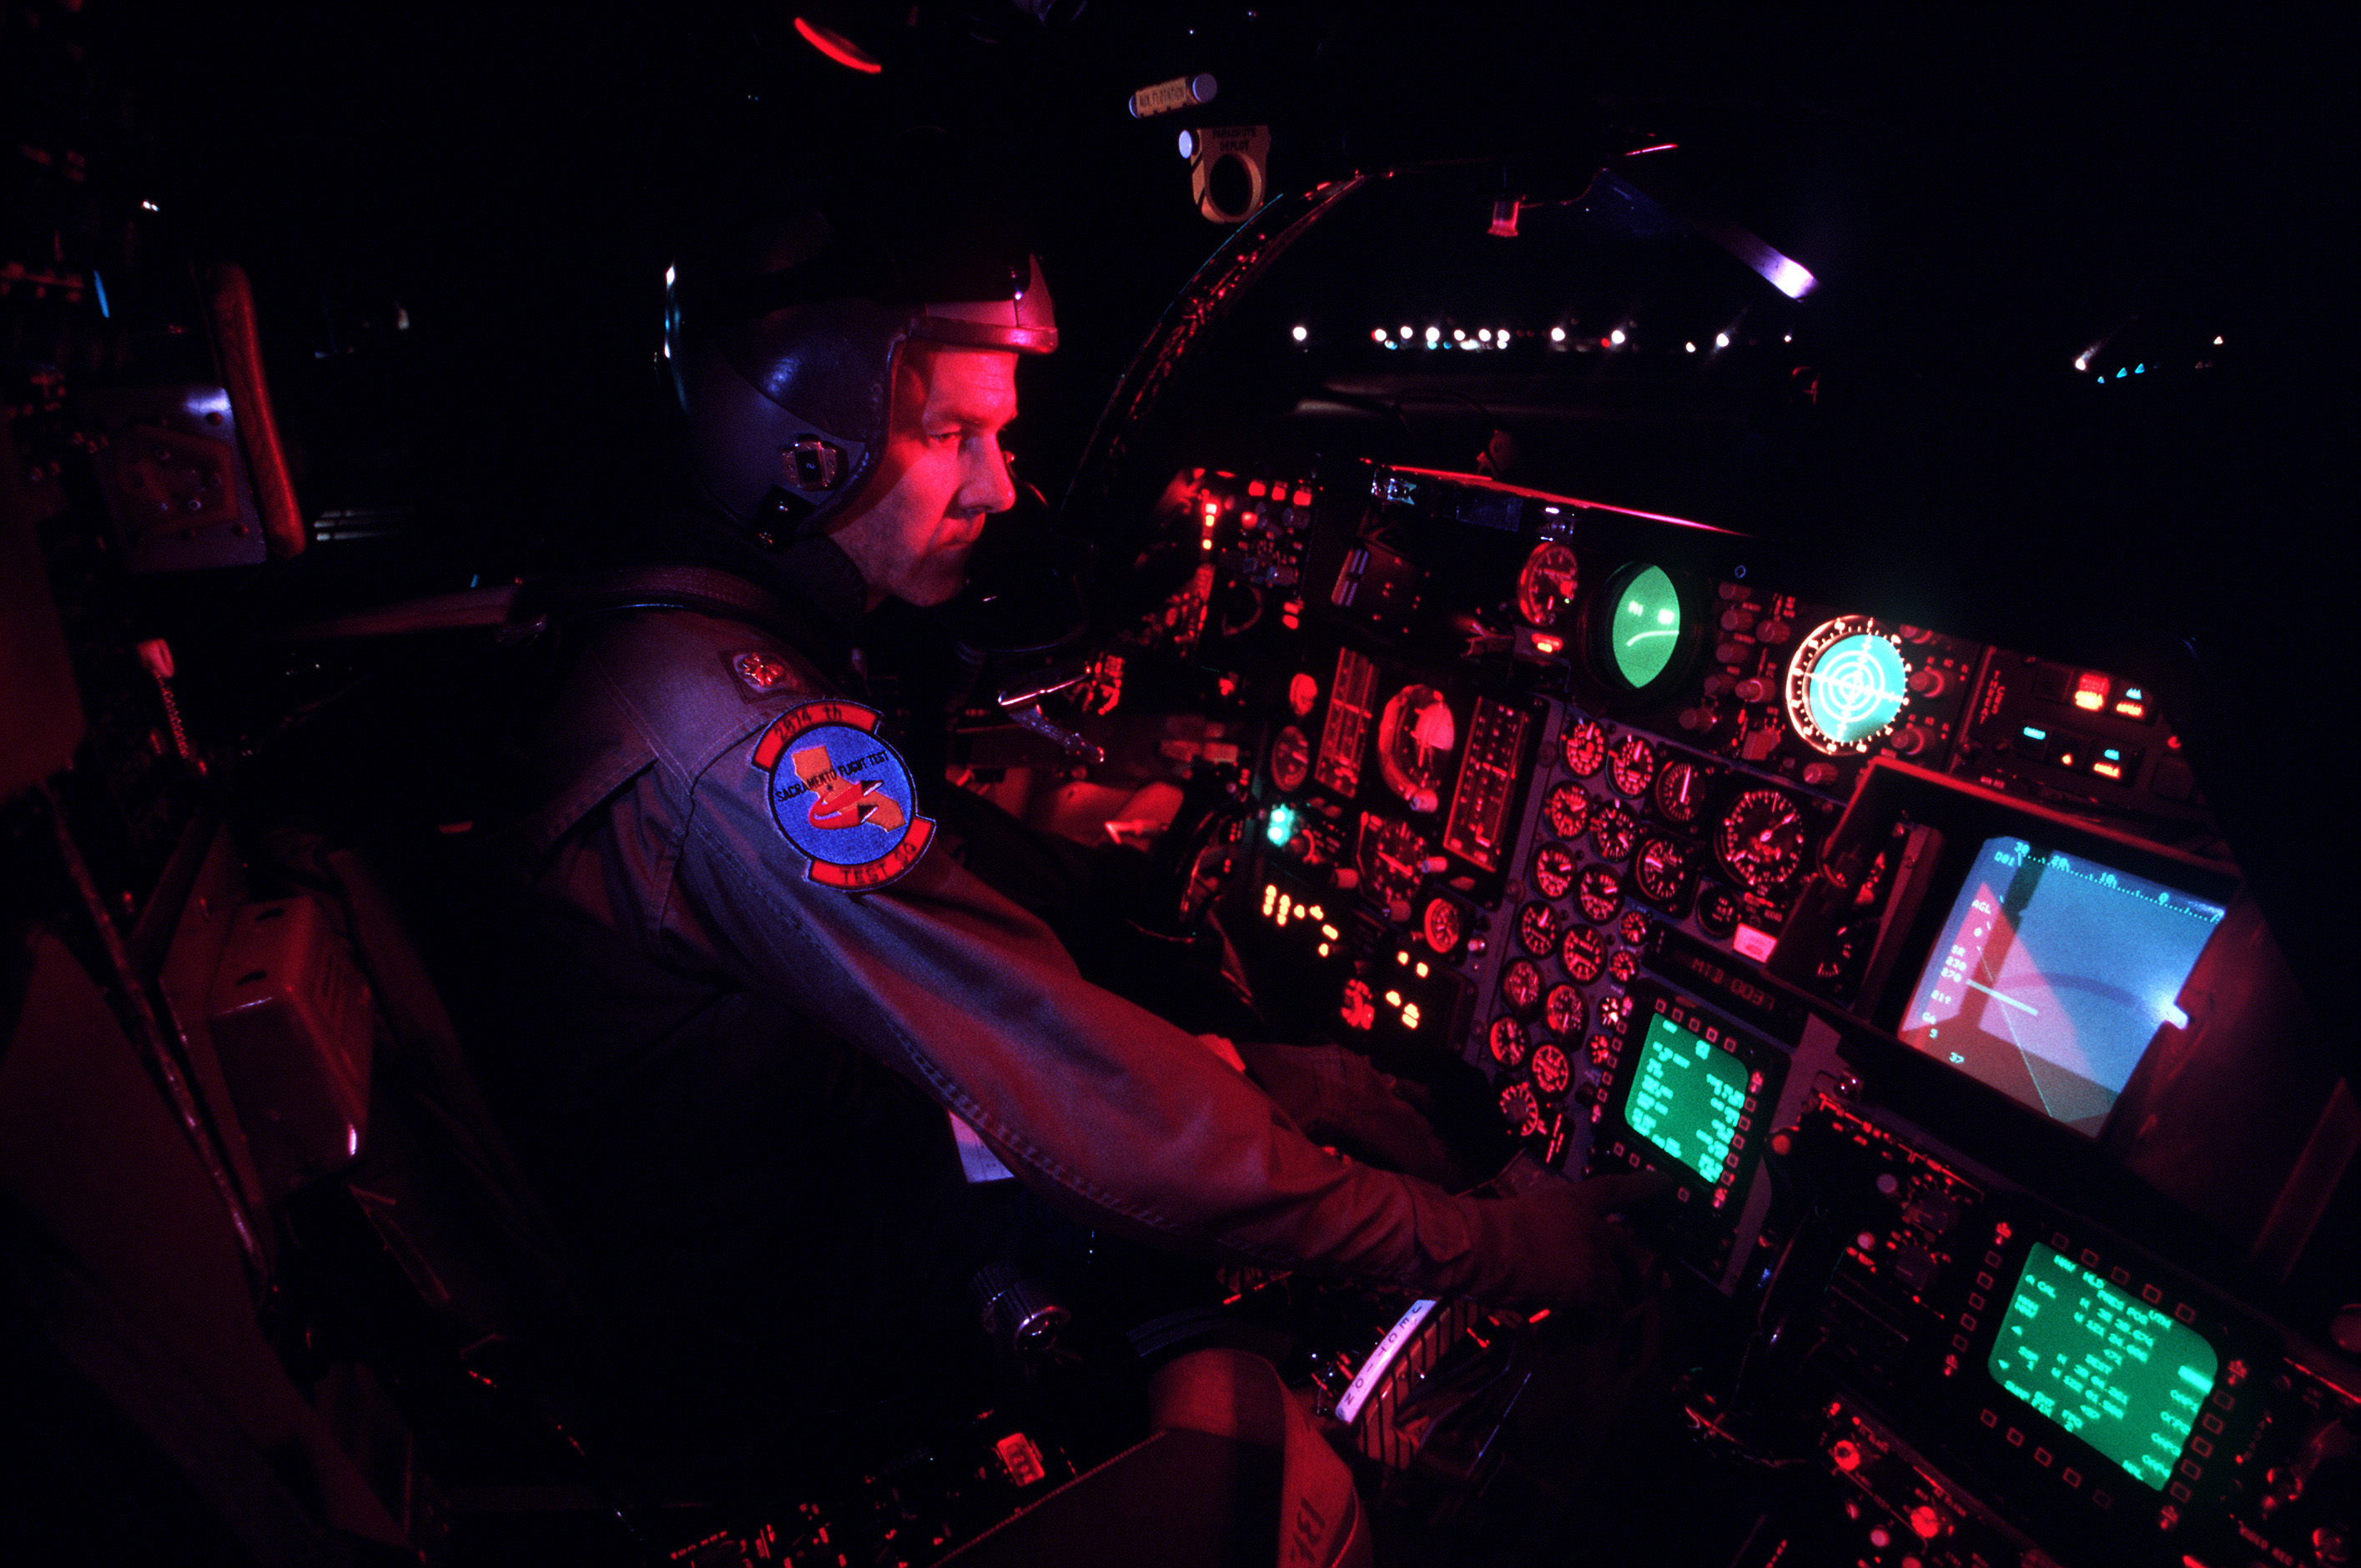 File:F-111 Night Cockpit.jpg - Wikimedia Commons